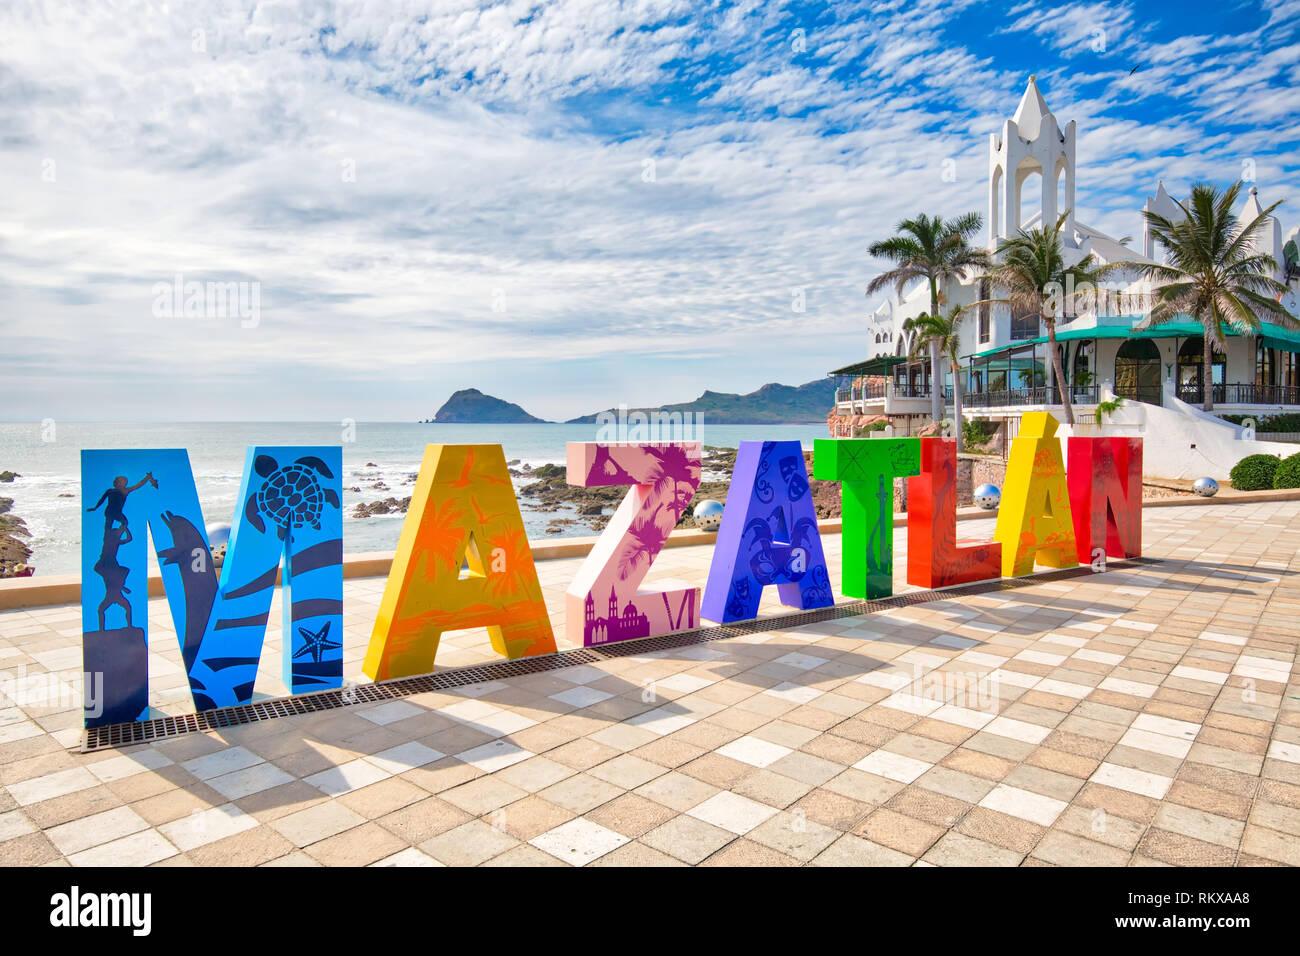 Mazatlan, Mexico-10 December, 2018: Big Mazatlan Letters at the entrance to Golden Zone (Zona Dorada), a famous touristic beach and resort zone in Mex Stock Photo